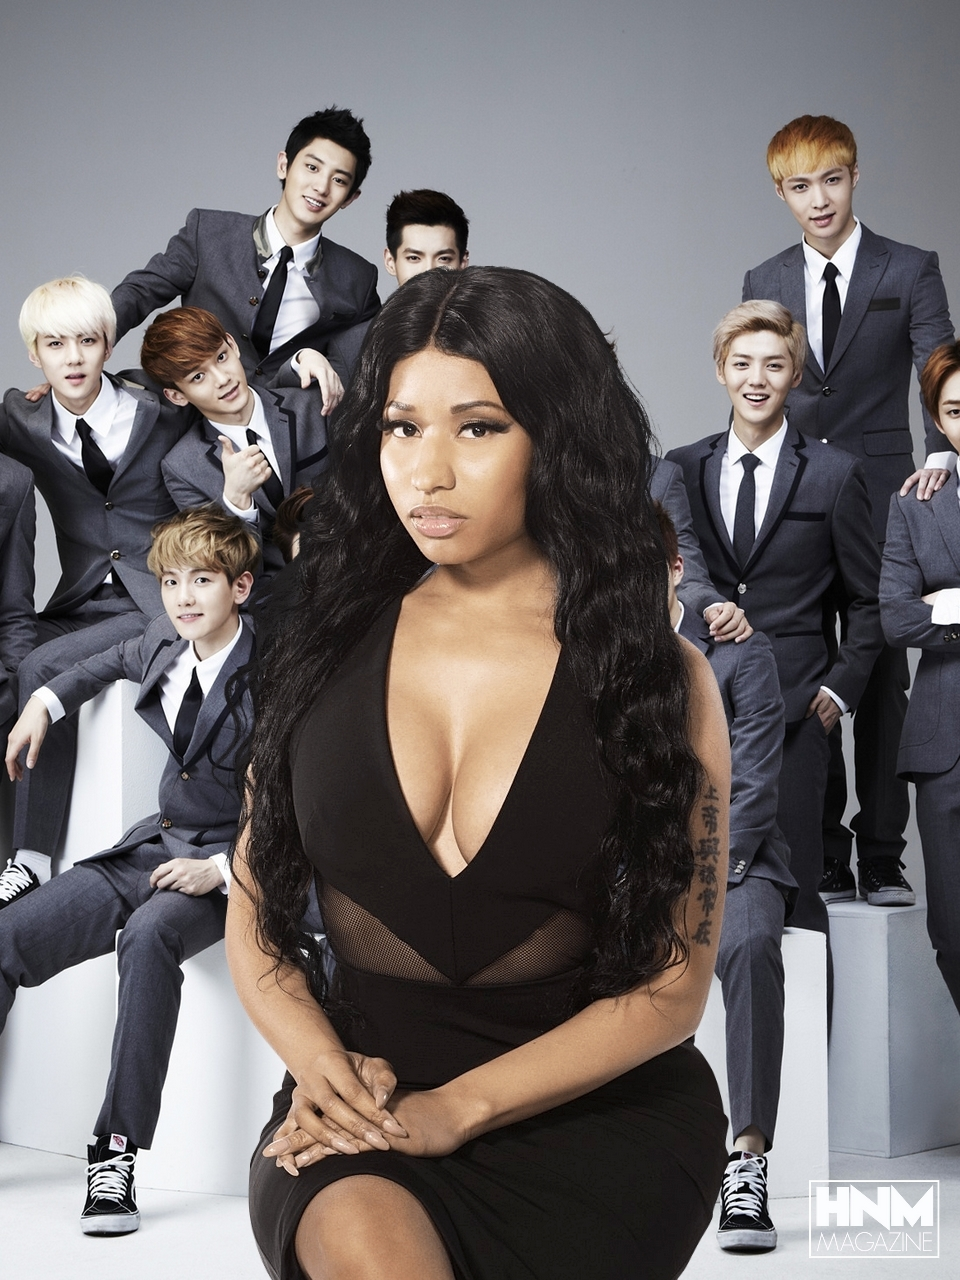 Le groupe EXO plagie Nicki Minaj & DavidGuetta!